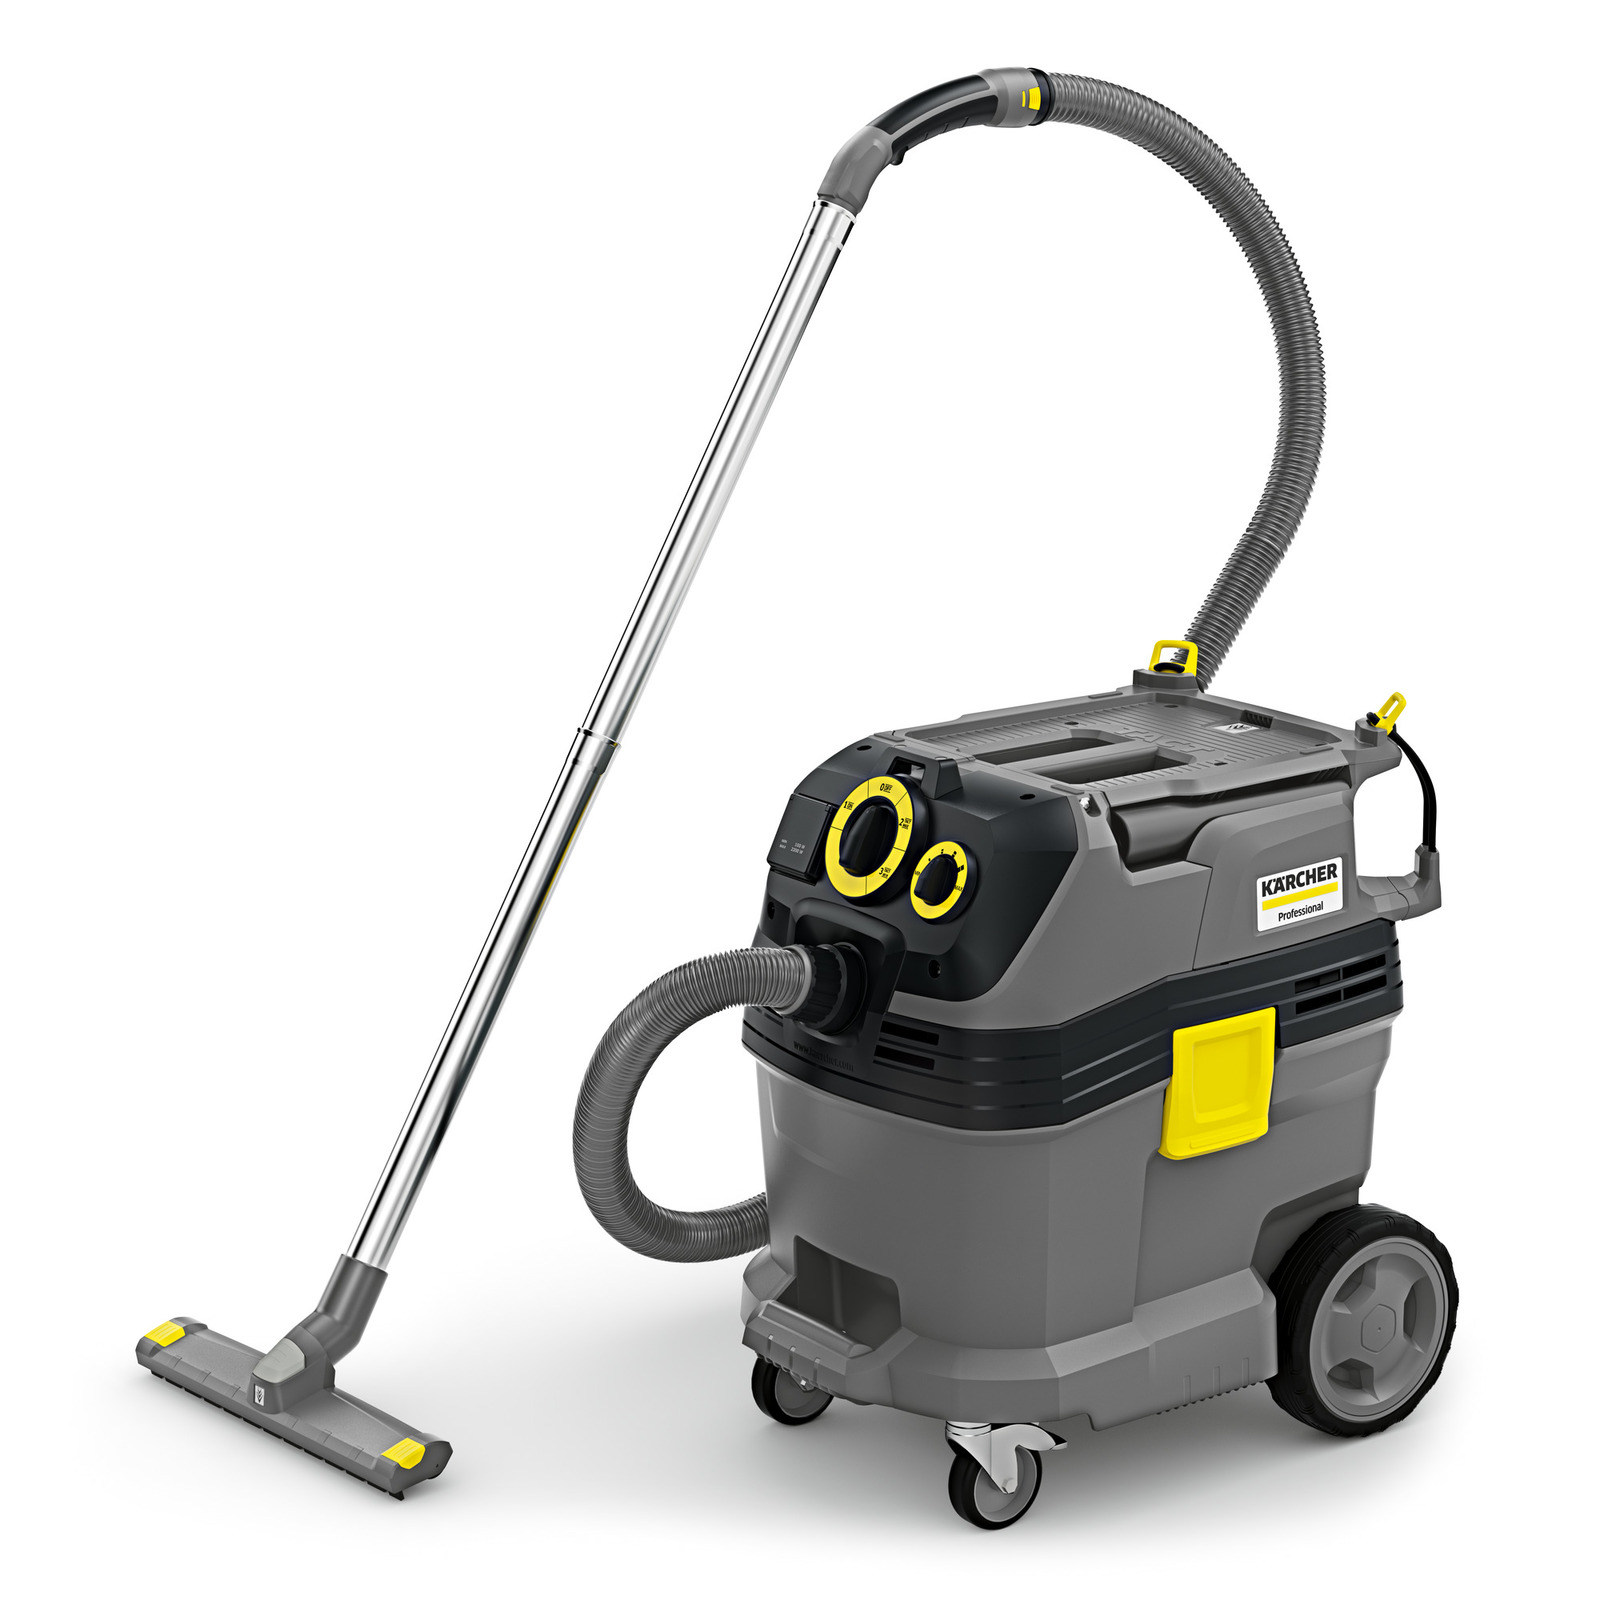 Wet Dry Commercial Vacuums Nt 30 1 Tact Te Hepa Kärcher